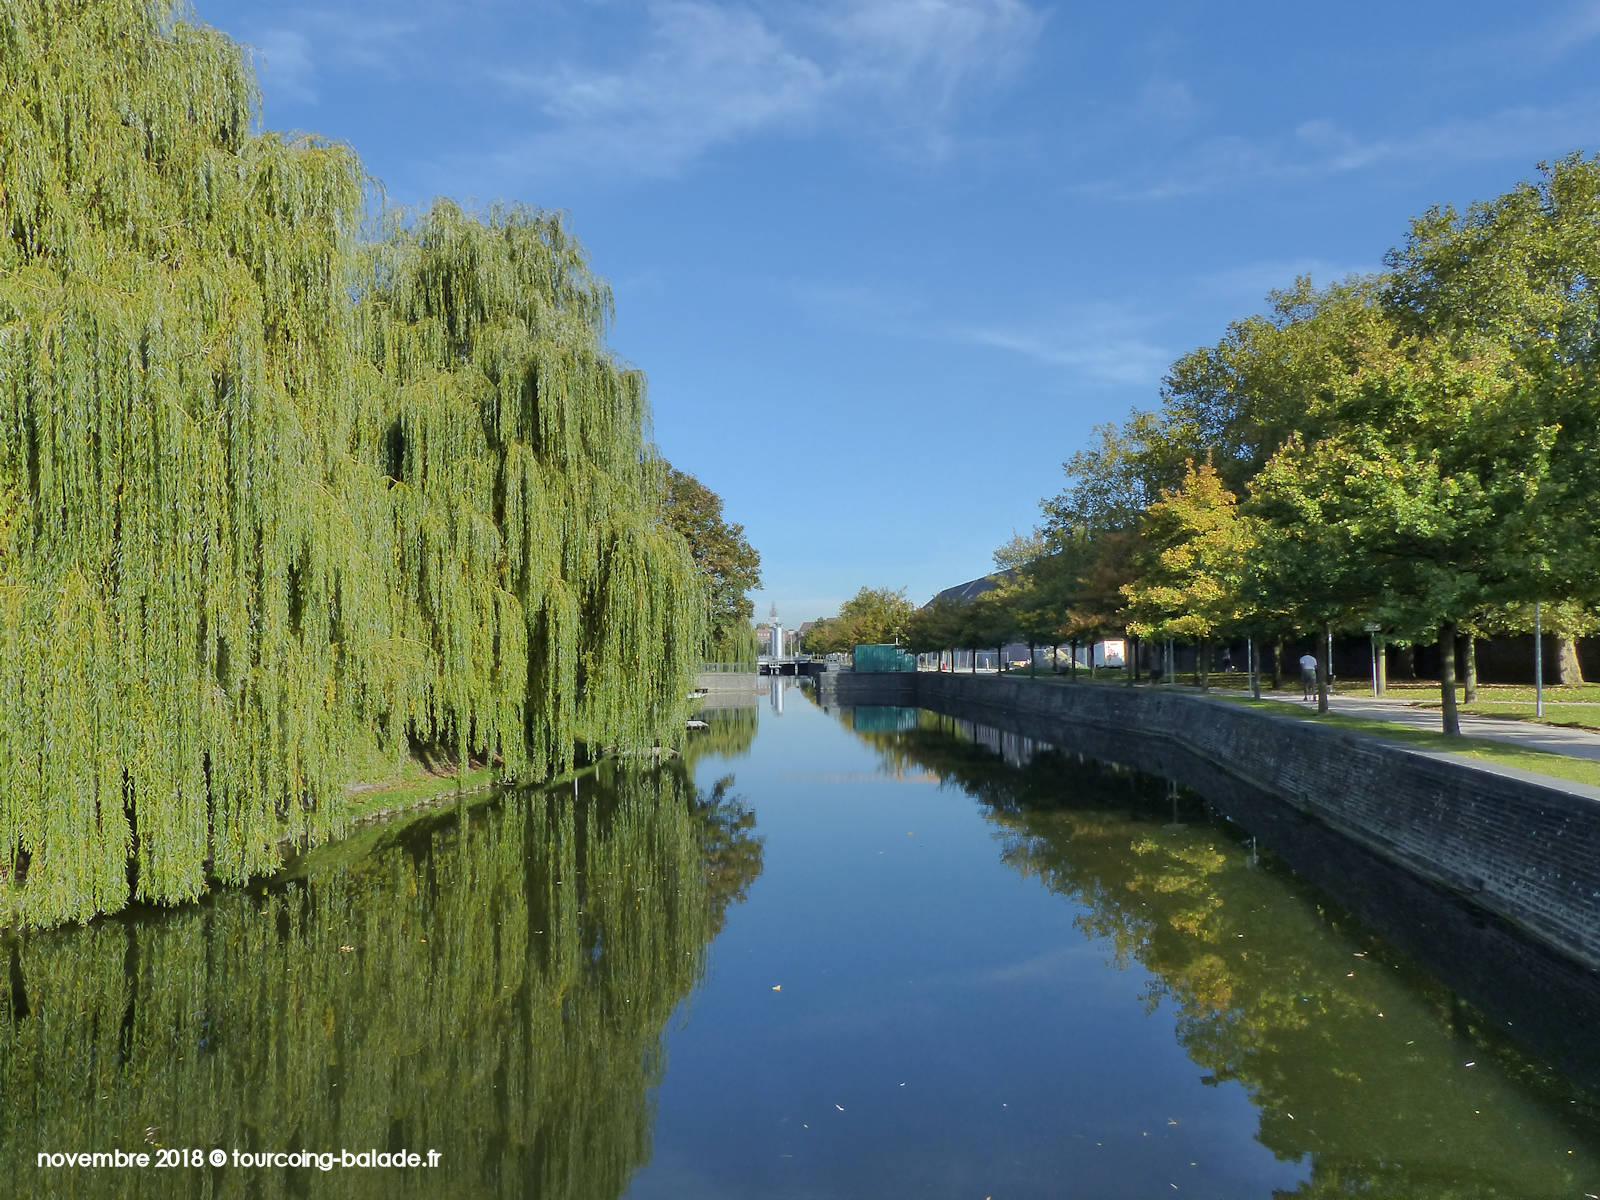 Canal de Tourcoing, quai de Bordeaux, 2018